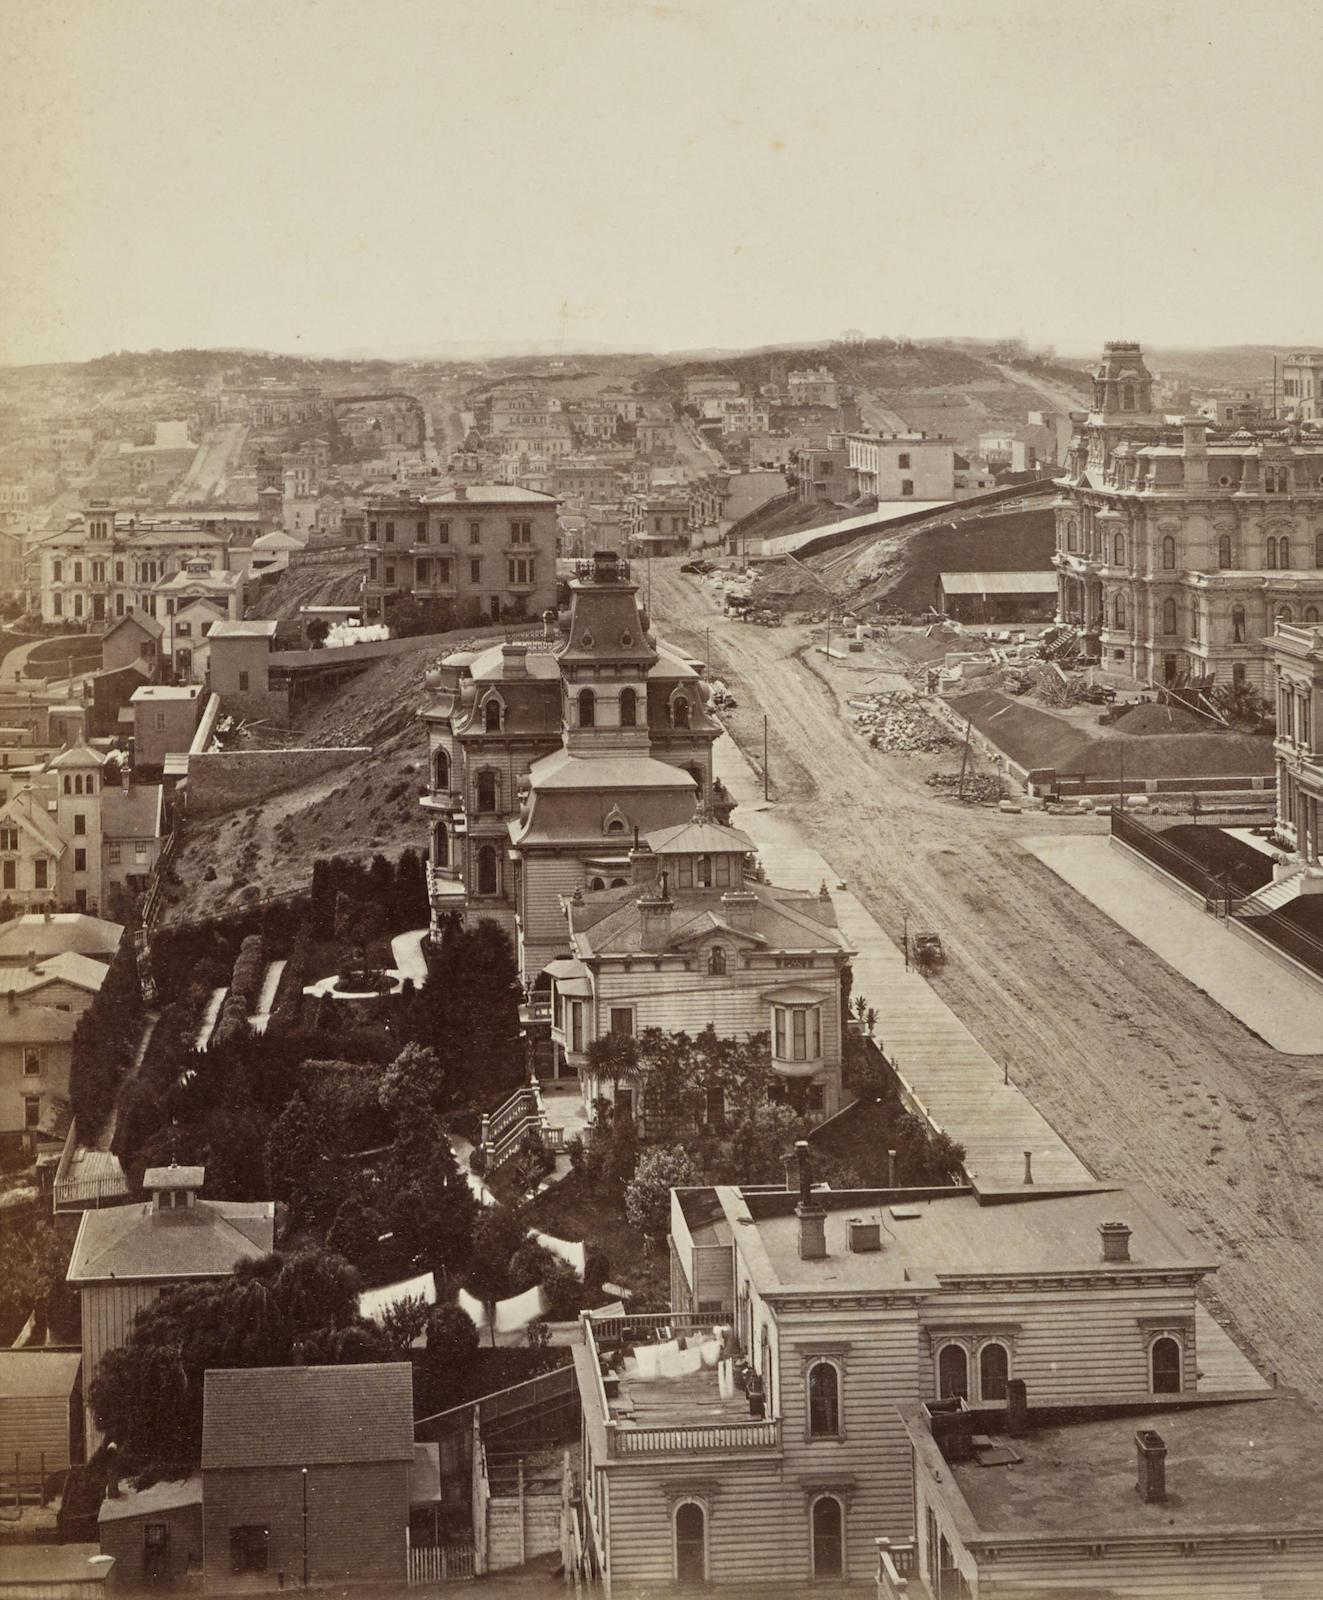 Eadweard Muybridge-Panorama Of San Francisco From California St. Hill-1877